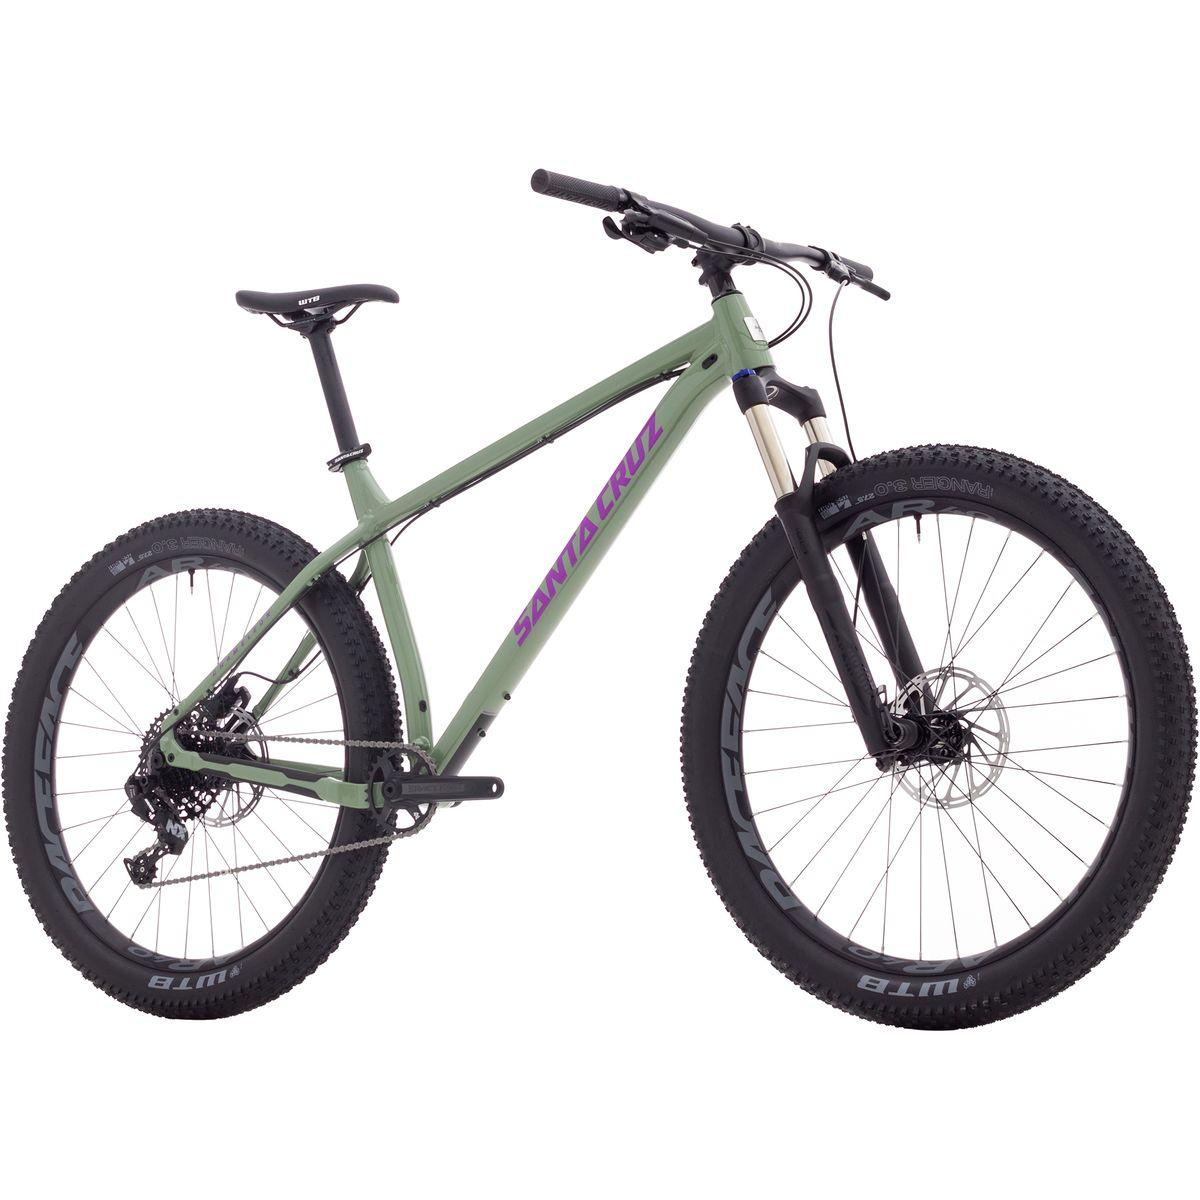 Santa Cruz Bicycles Chameleon 27.5+ D Complete Mountain Bike - 2018 ...